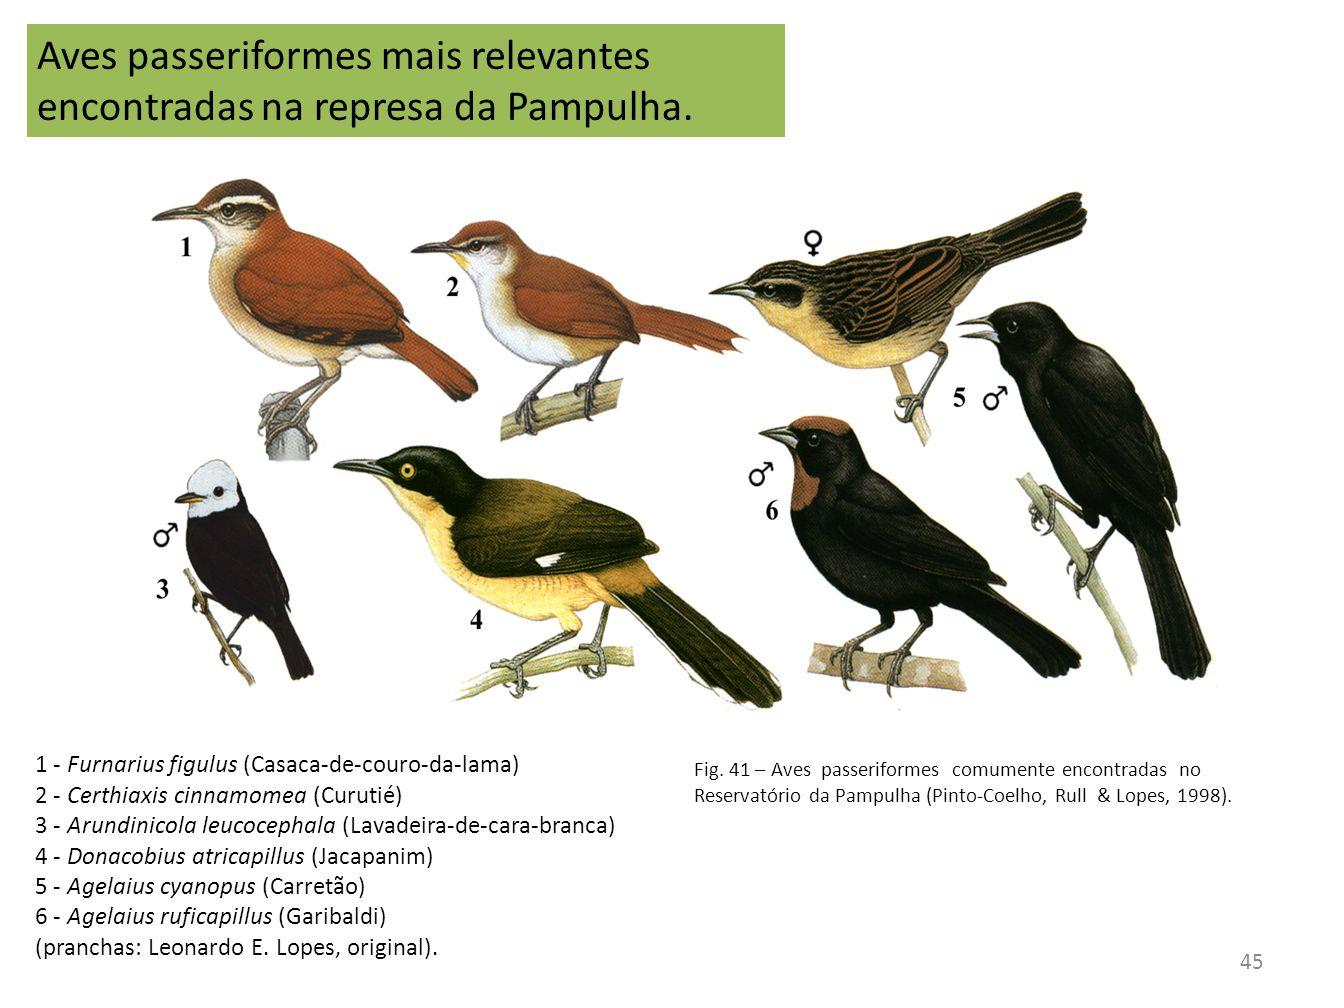 1 - Furnarius figulus (Casaca-de-couro-da-lama) 2 - Certhiaxis cinnamomea (Curutié) 3 - Arundinicola leucocephala (Lavadeira-de-cara-branca) 4 - Donac